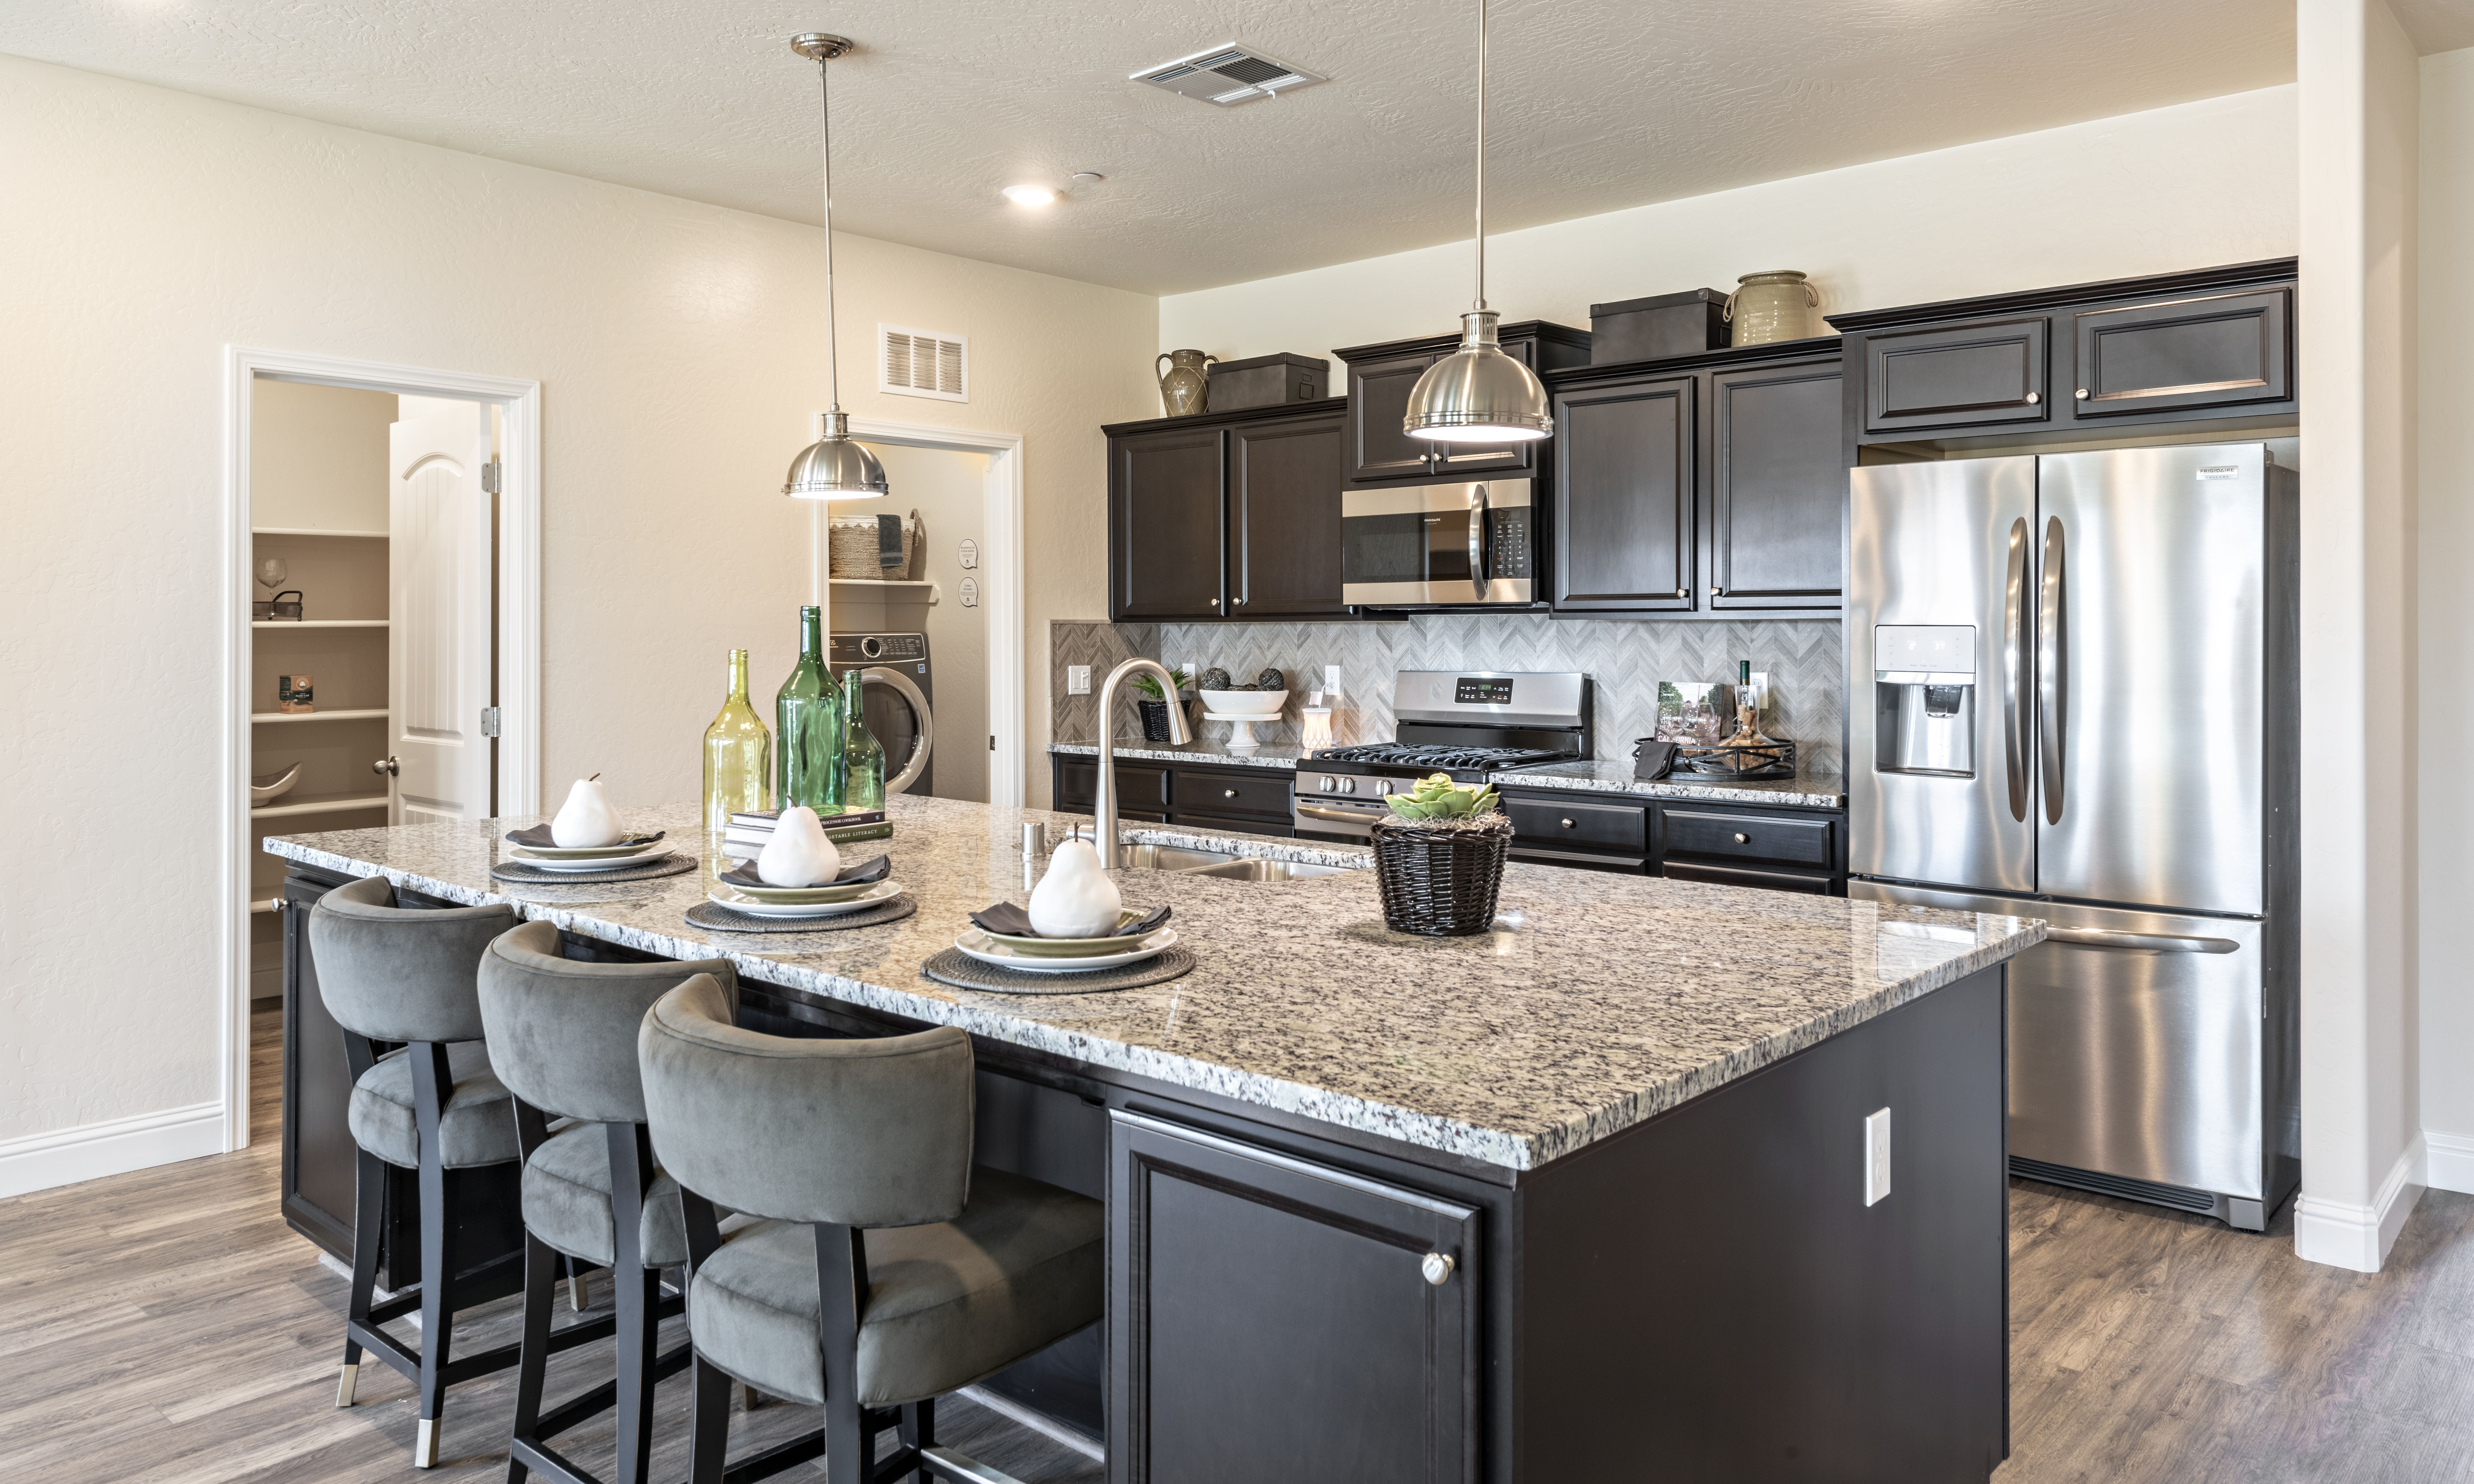 Dark Wood Kitchen Cabinets With Granite Counter Tops And Herringbone Backsplash Modern Bold In 2020 Kitchen Tops Granite New Homes For Sale Dark Wood Kitchen Cabinets